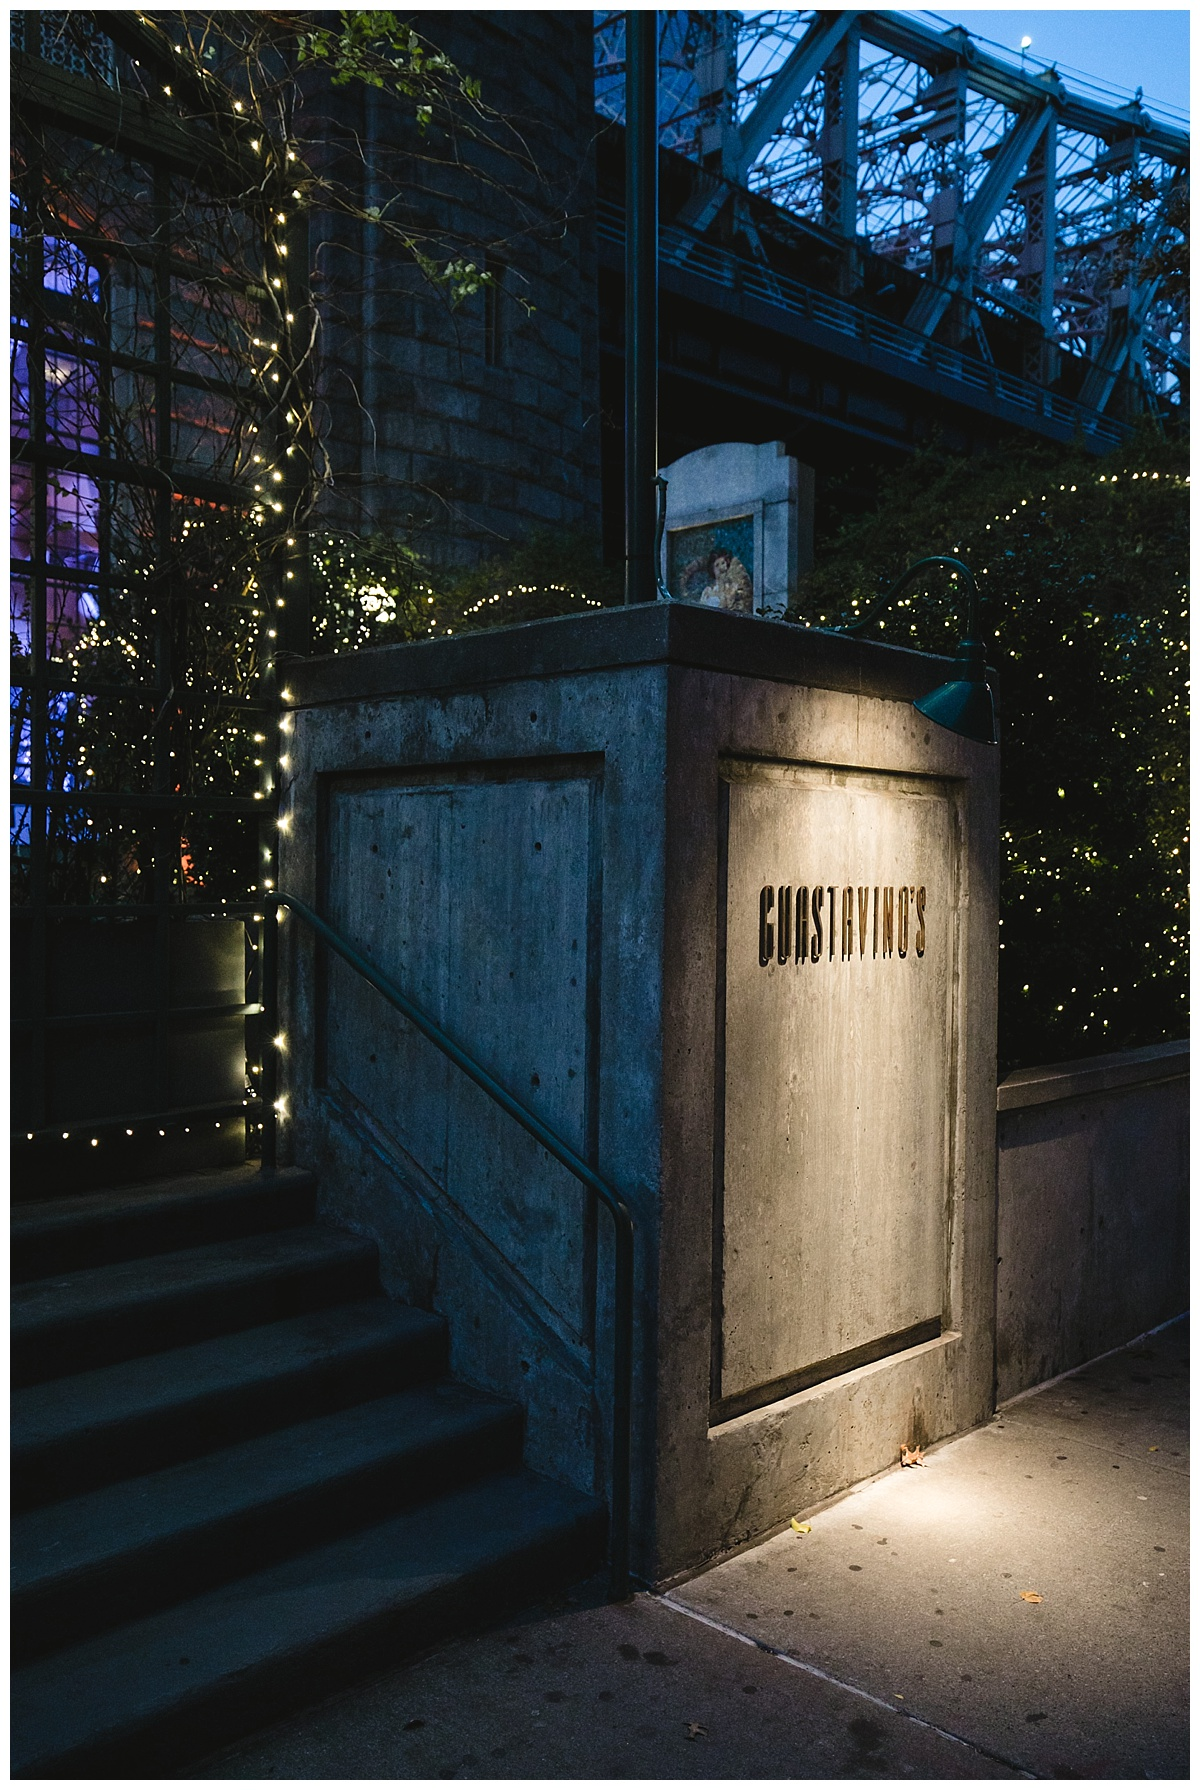 An exterior look of Guastavinos in New York City.